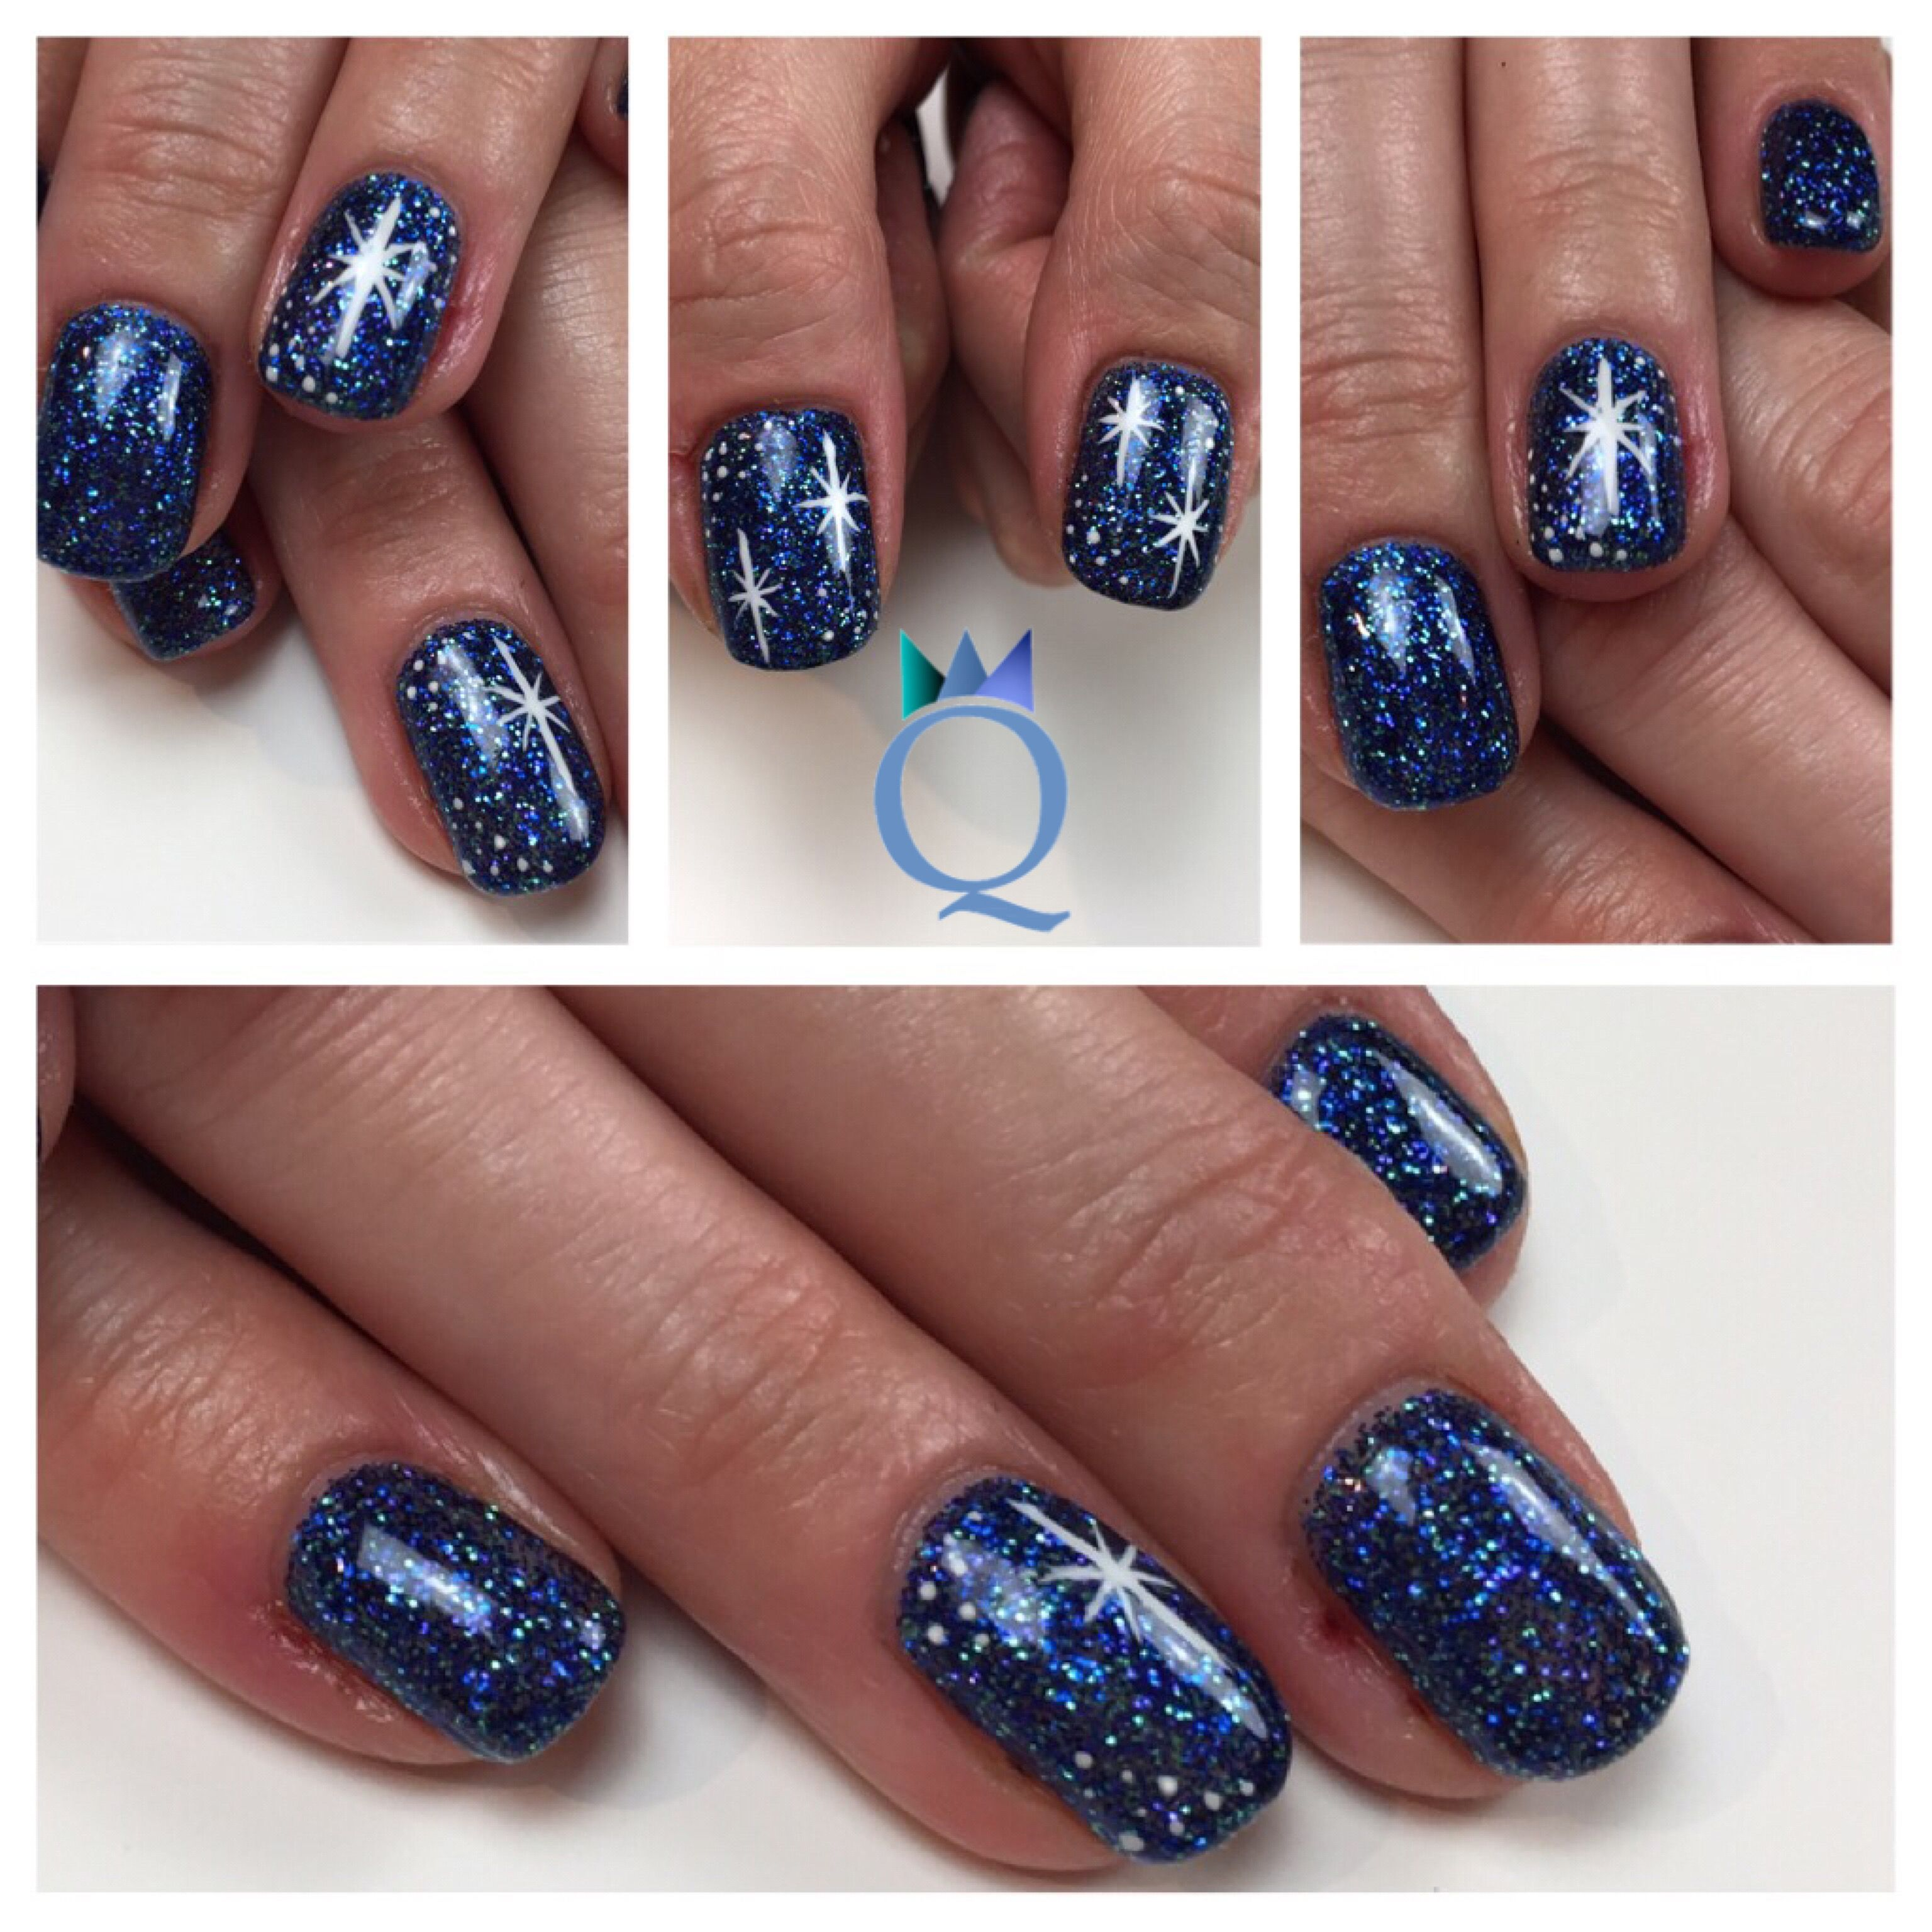 shortnails #gelnails #nails #blue #glitter #white #handpainted ...